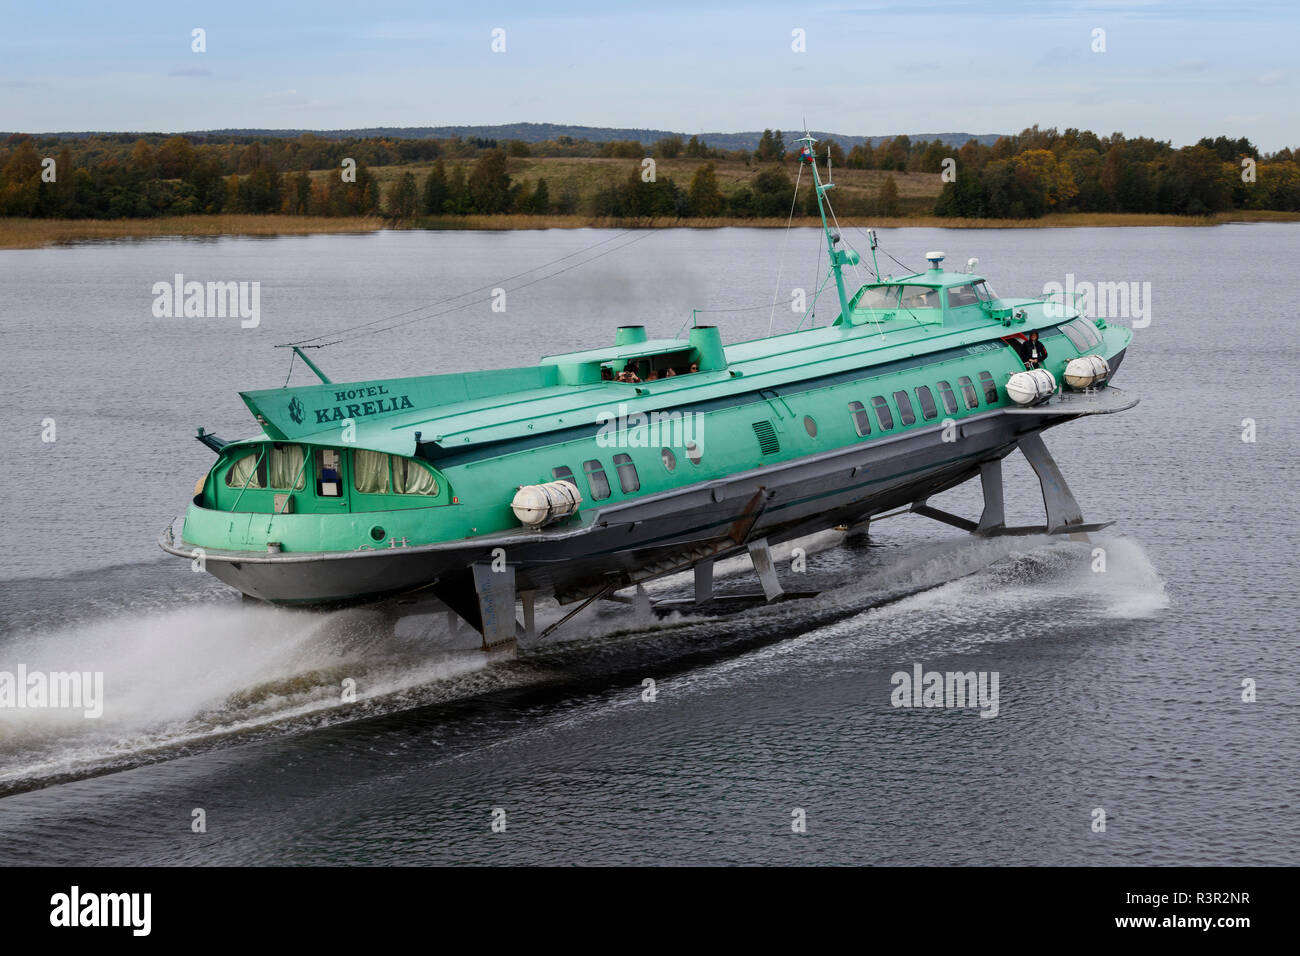 The Hotel Karelia 1970 Kometa-5 hydrofoil on the waters of Lake Onega, near Kizhi Island, Russia. - Stock Image